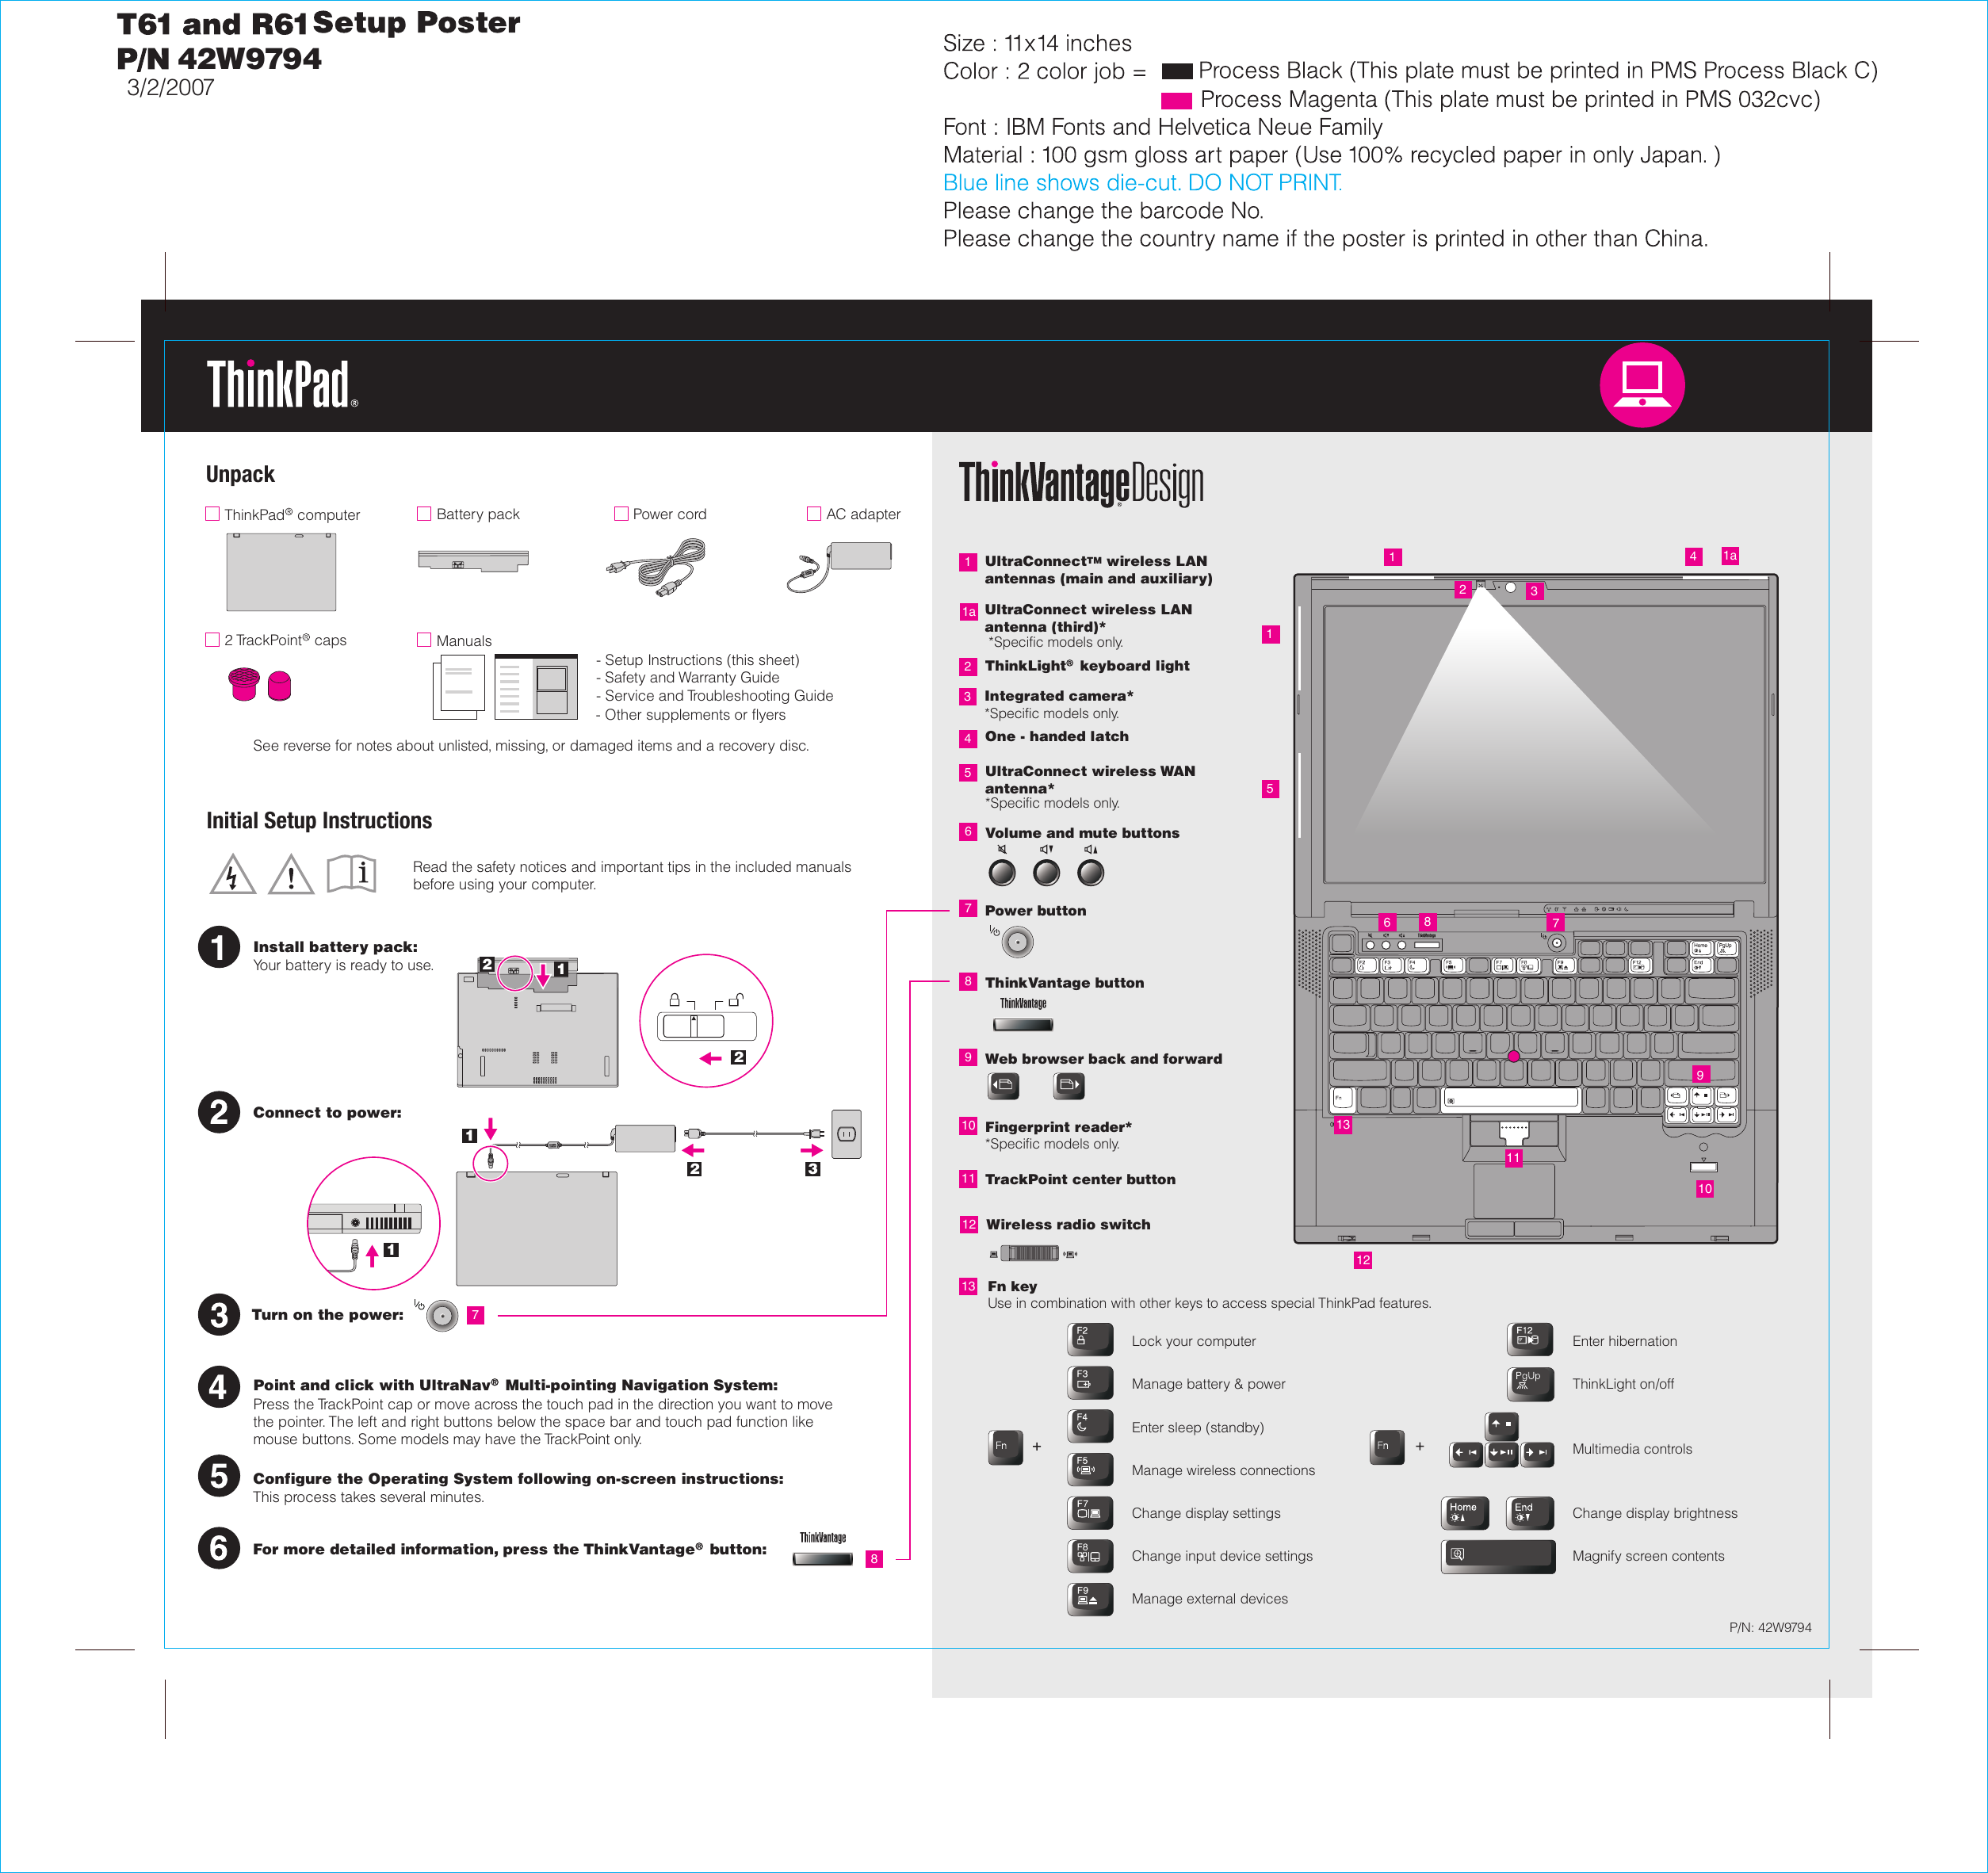 lenovo thinkpad t61 user manual